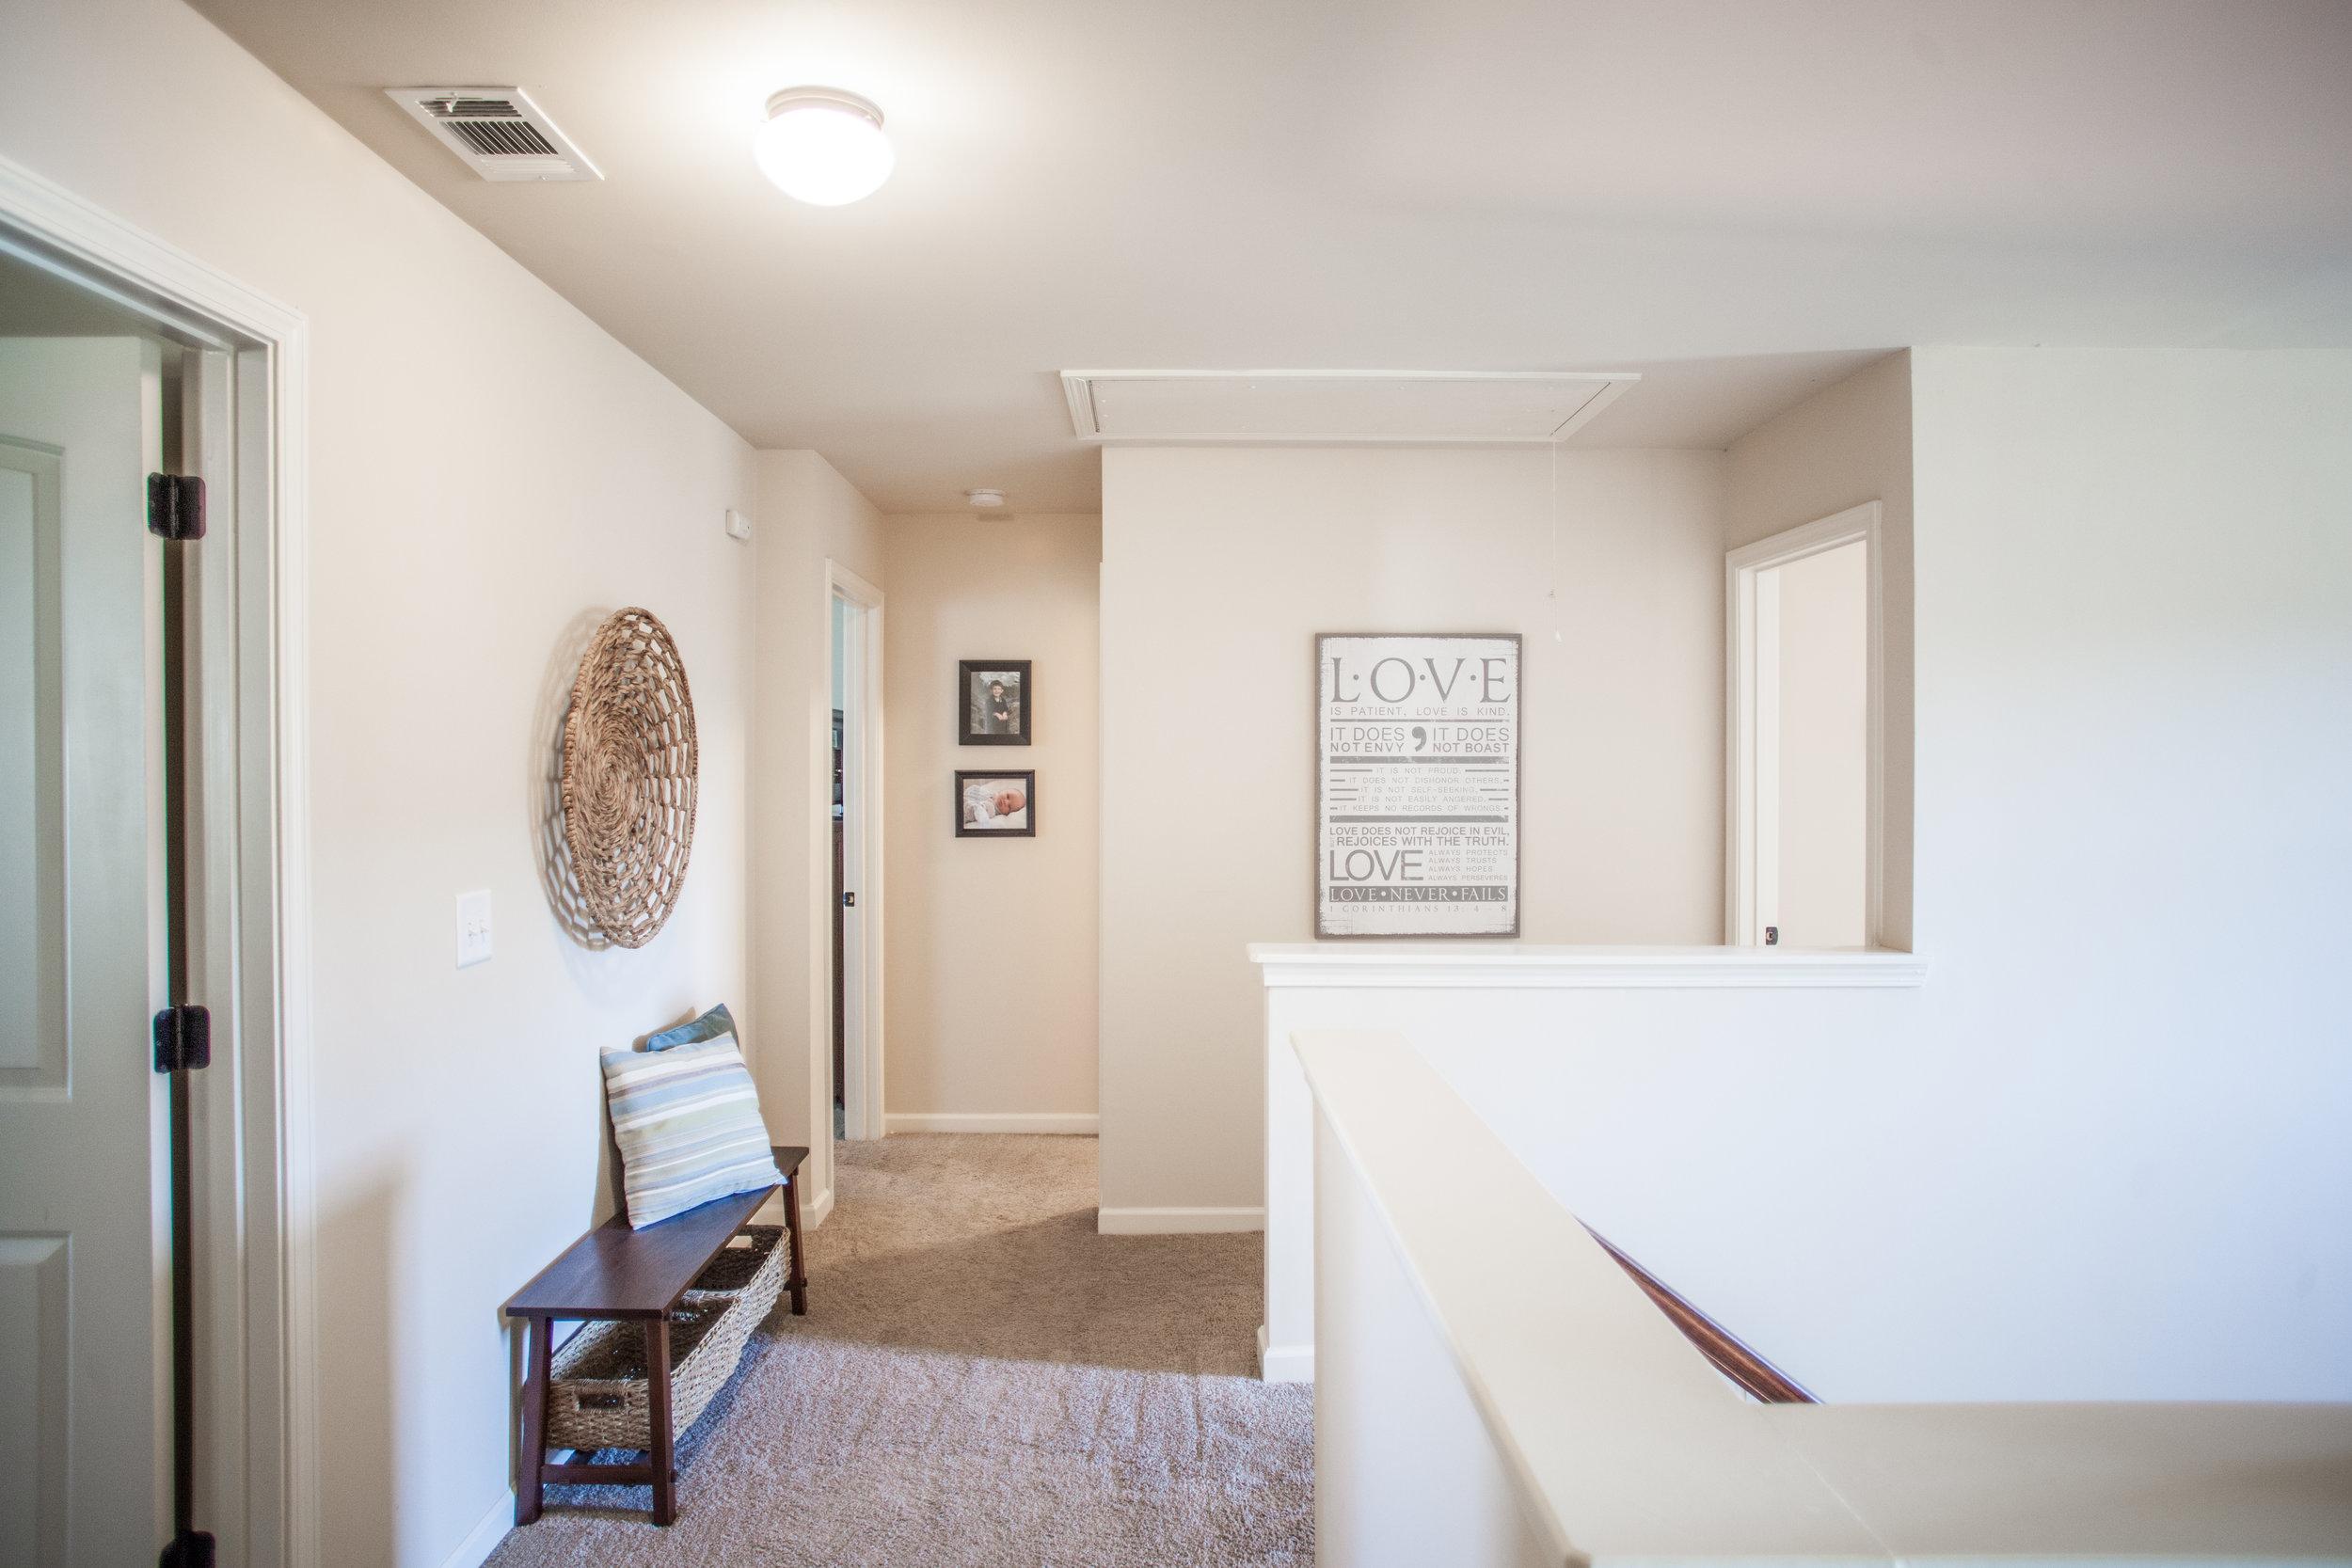 woodstock-ga-house-for-sale-wingard-real-estate-under-300k-13.jpg